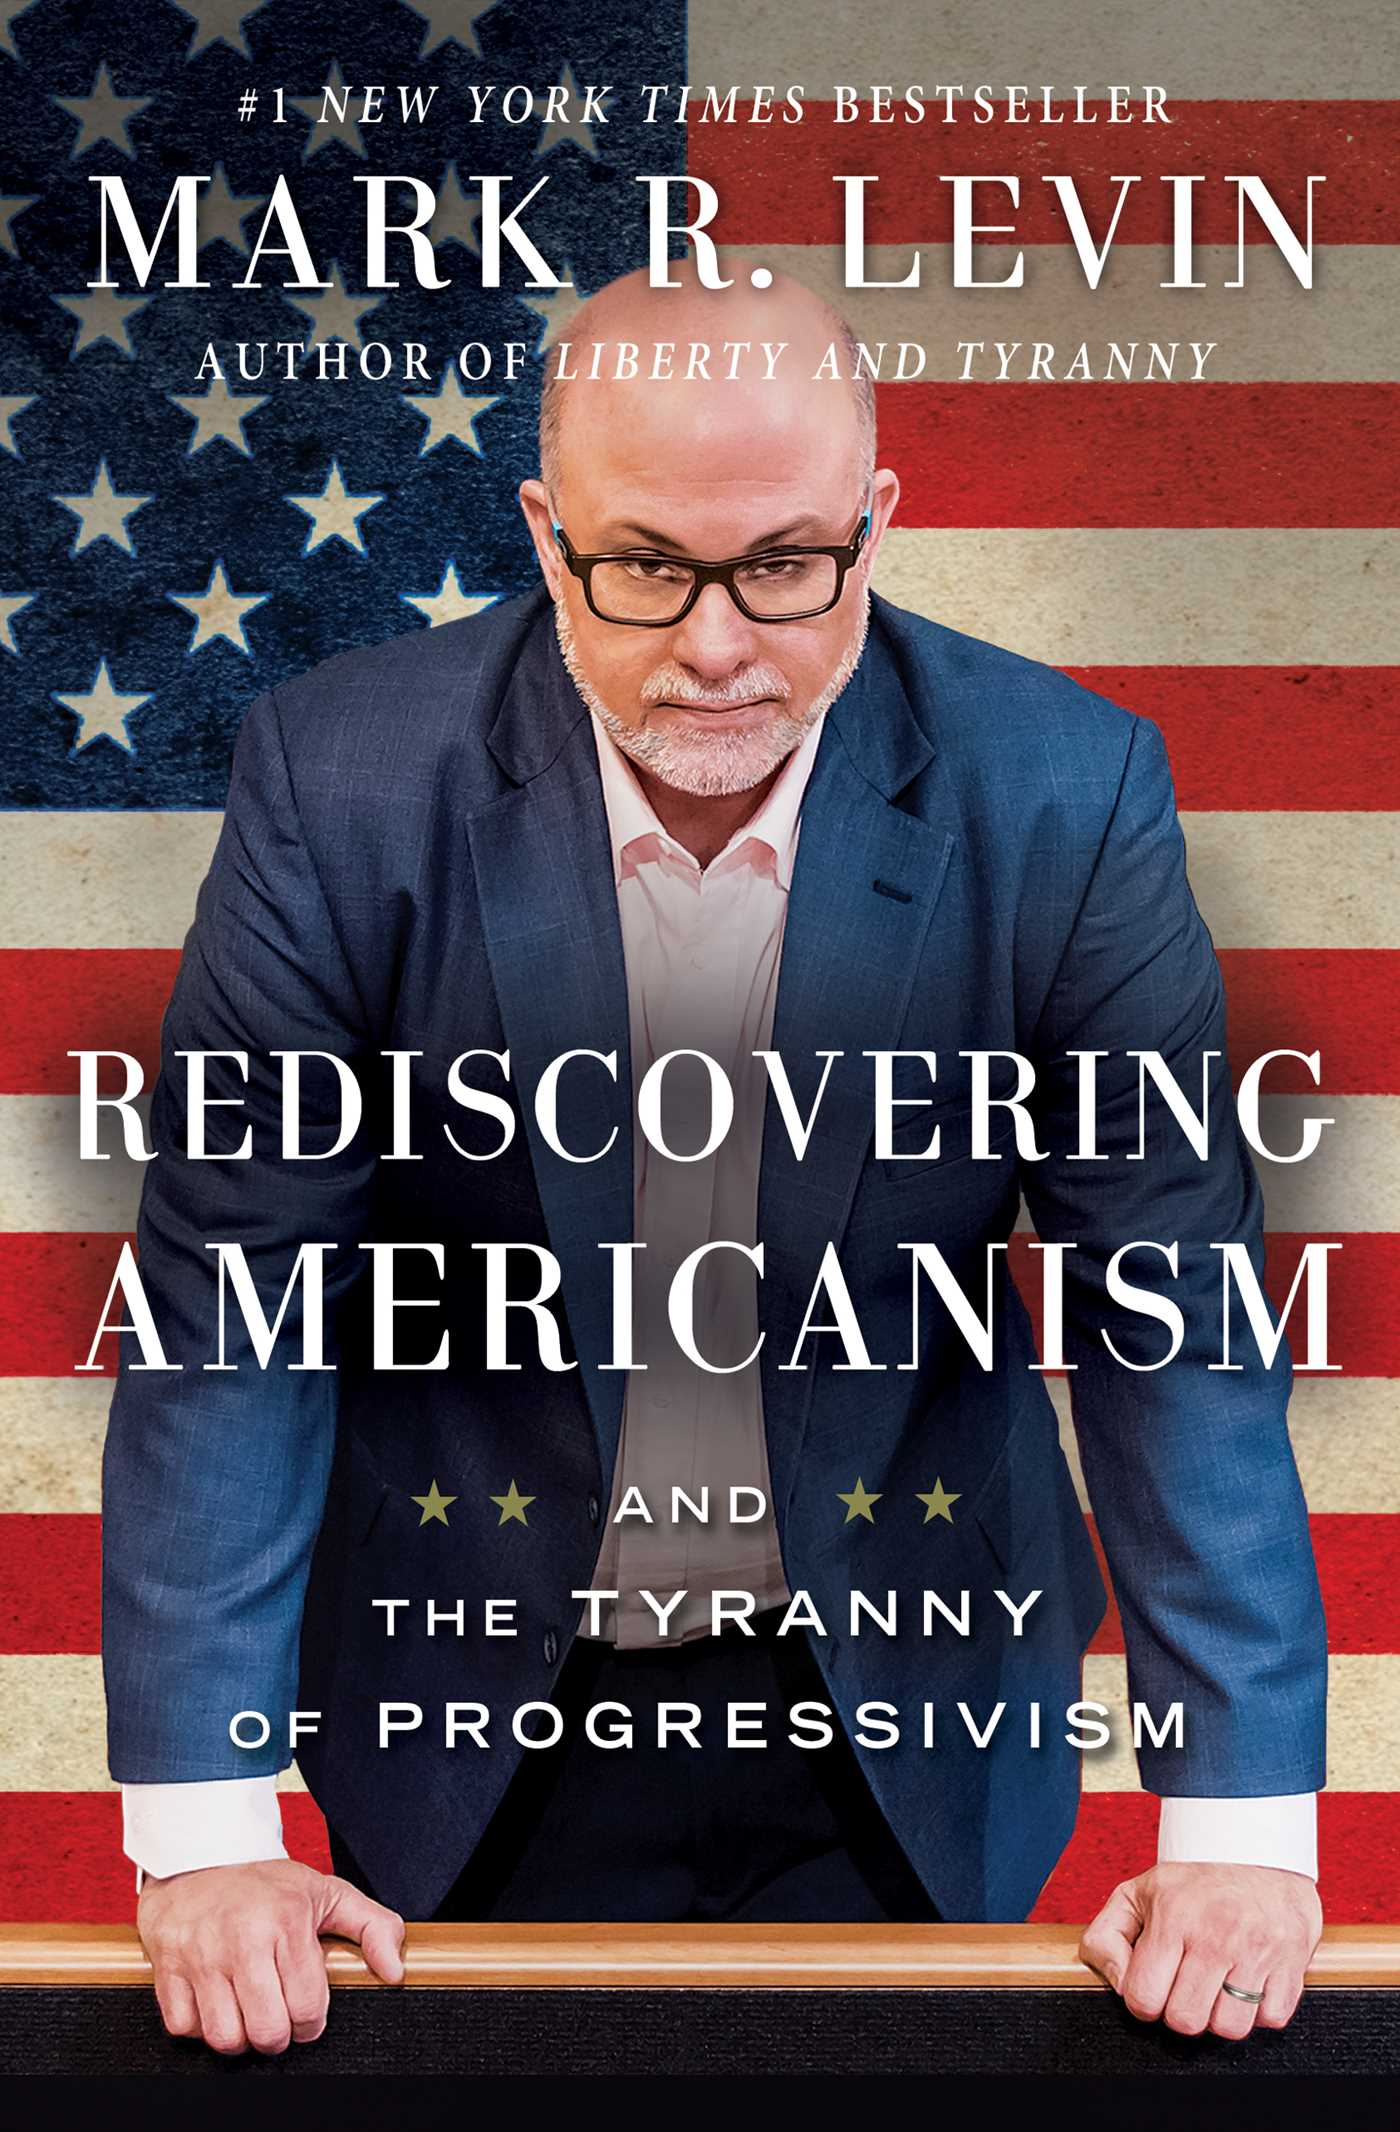 Rediscovering americanism 9781476773452 hr